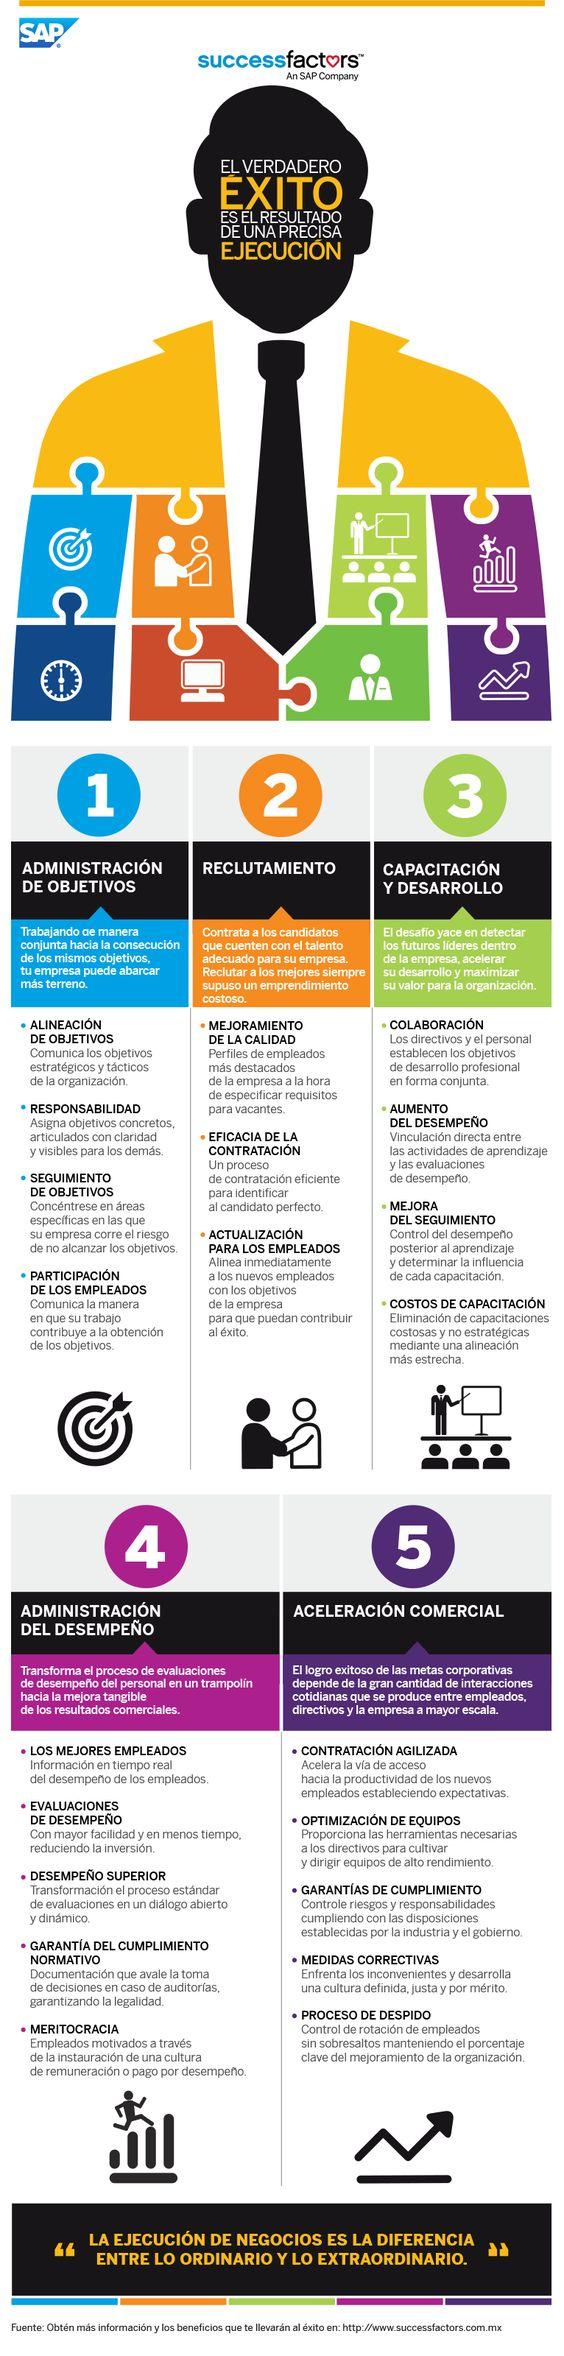 Recursos humanos: mejores decisiones para cambios reales. #infografia: